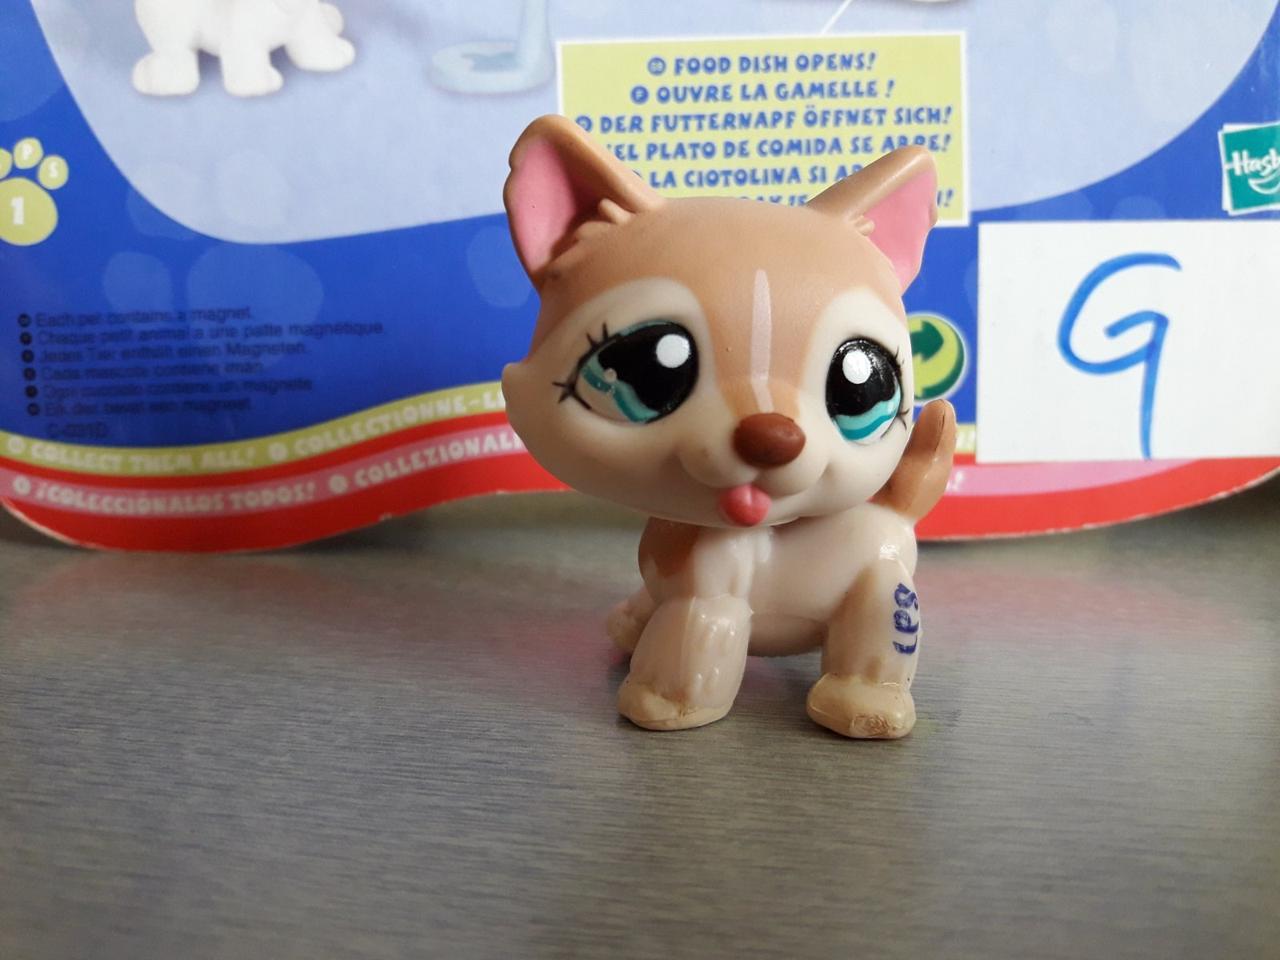 Lps littlest pet shop стоячки - лпс Хаски #1012 Hasbro старая коллекция